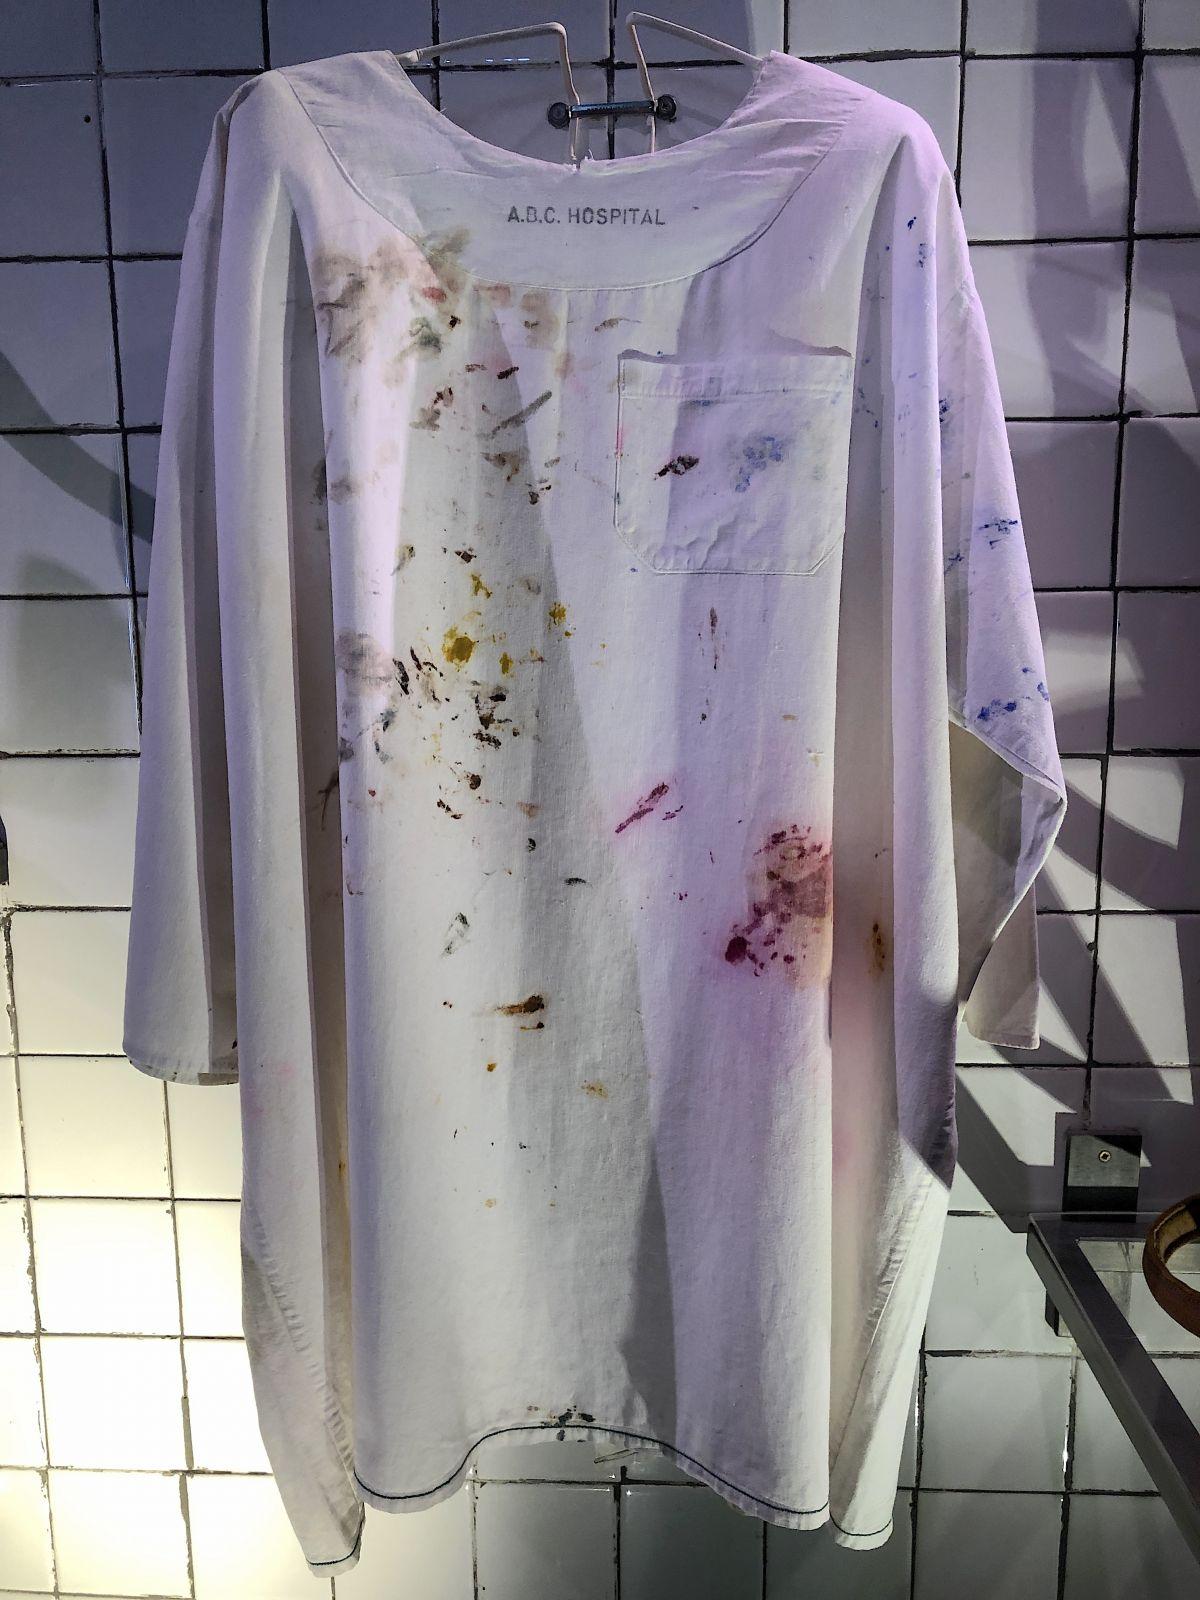 frida-kahlo-hospital-gown